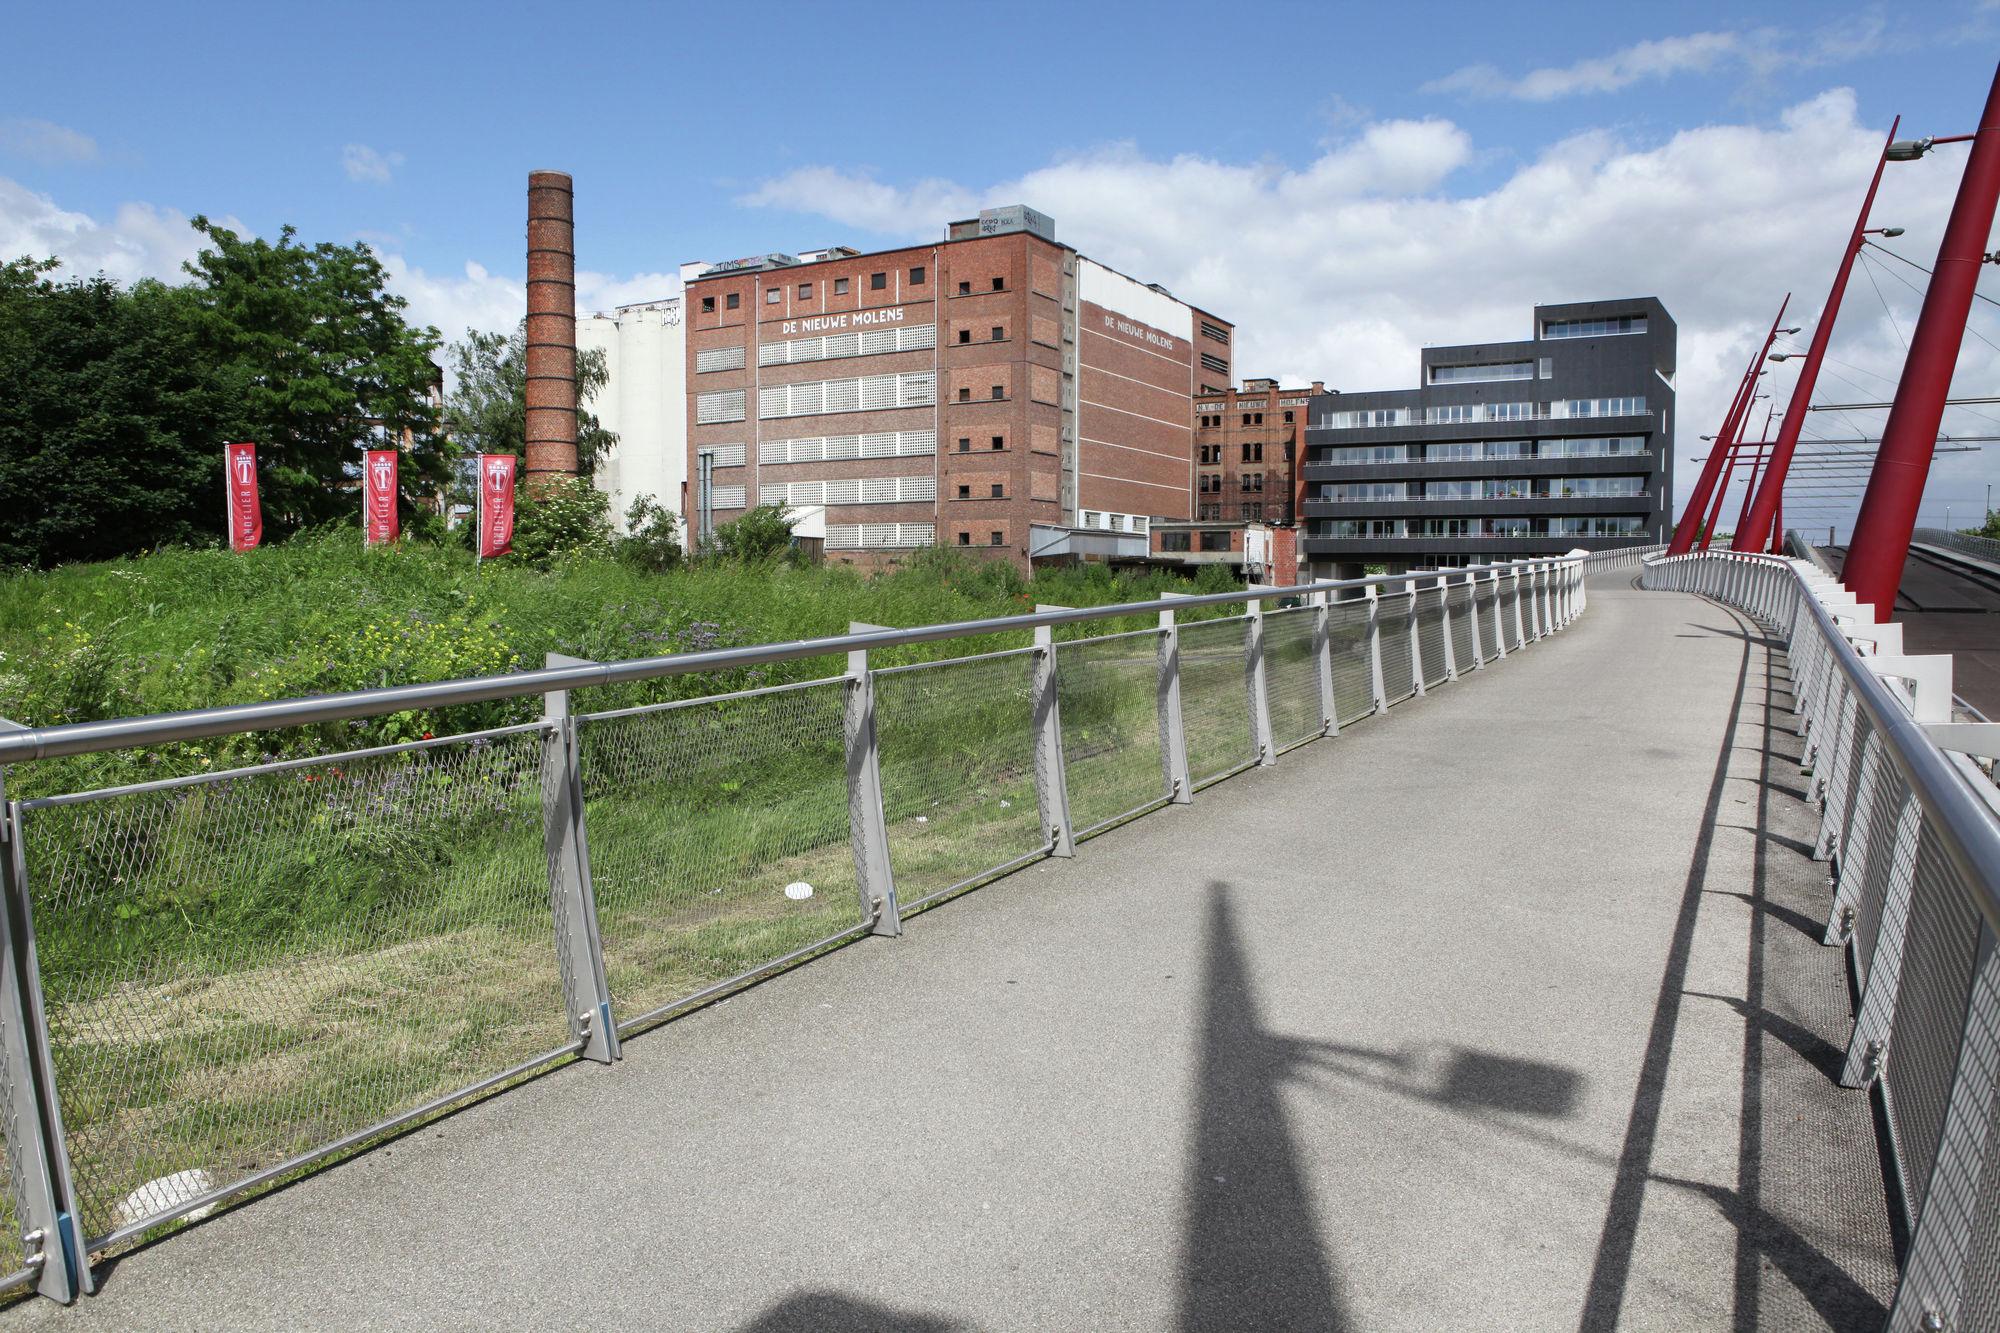 gaardeniersbrug en nieuwe molens (7)©Layla Aerts.jpg